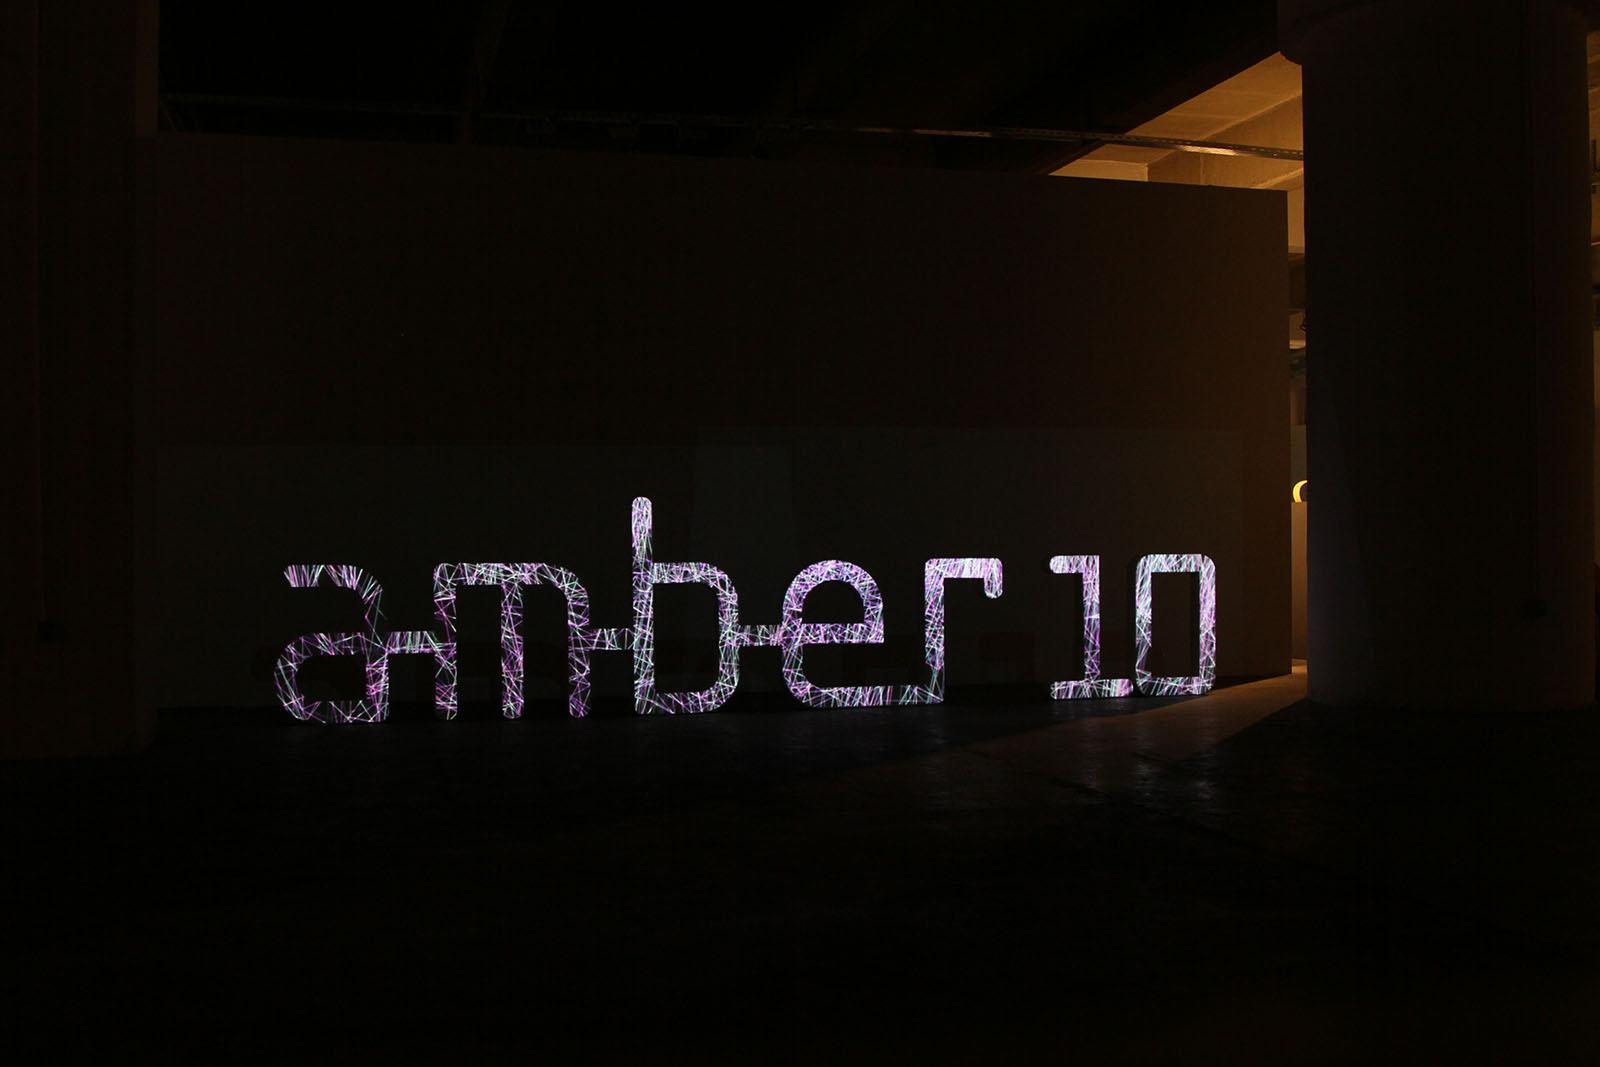 amber_004.JPG